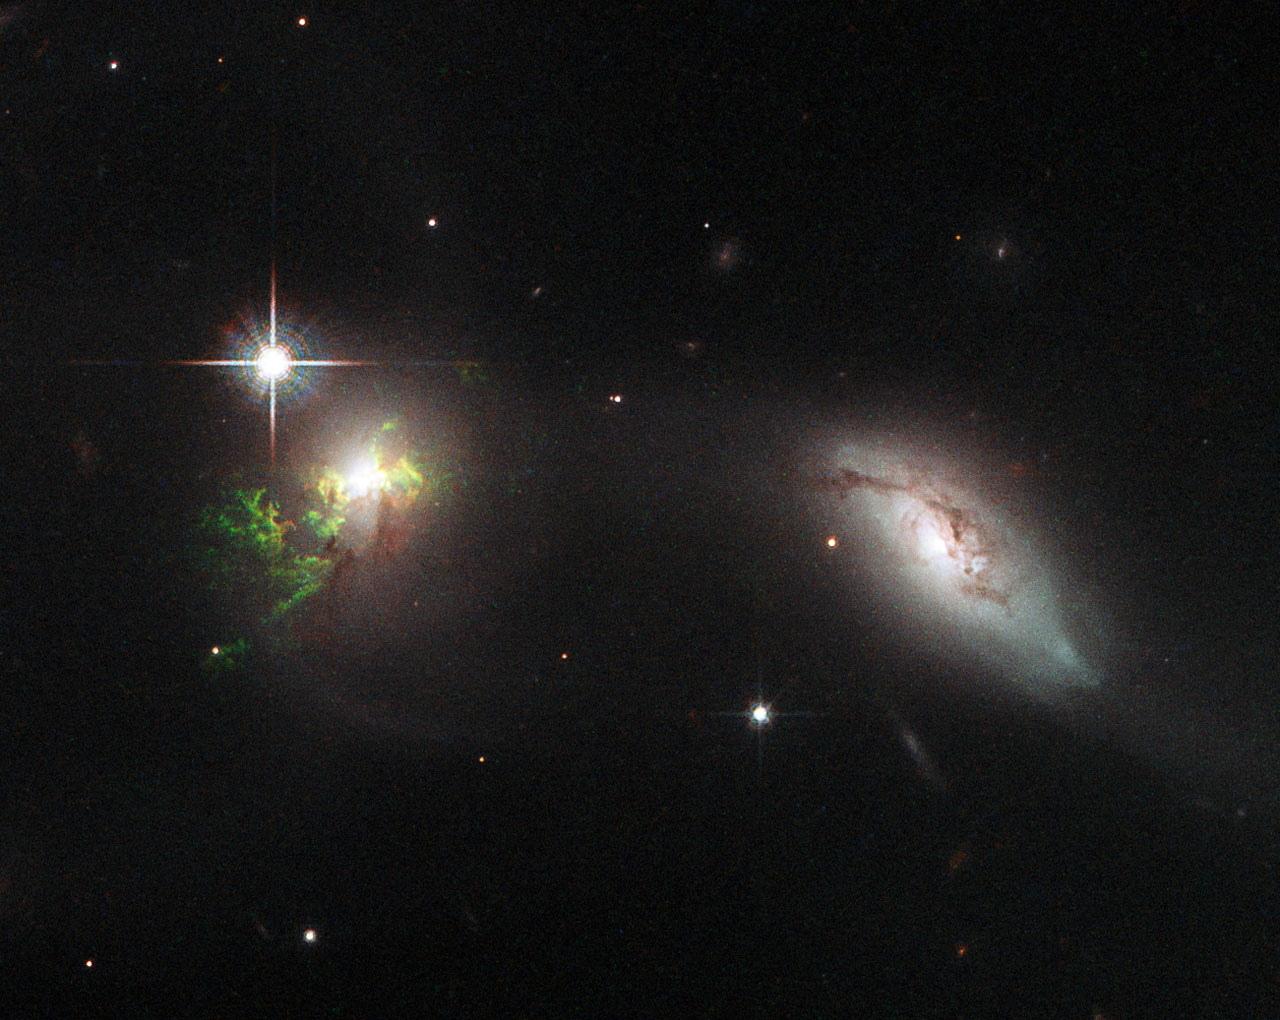 Green Filament in Galaxy UGC 11185